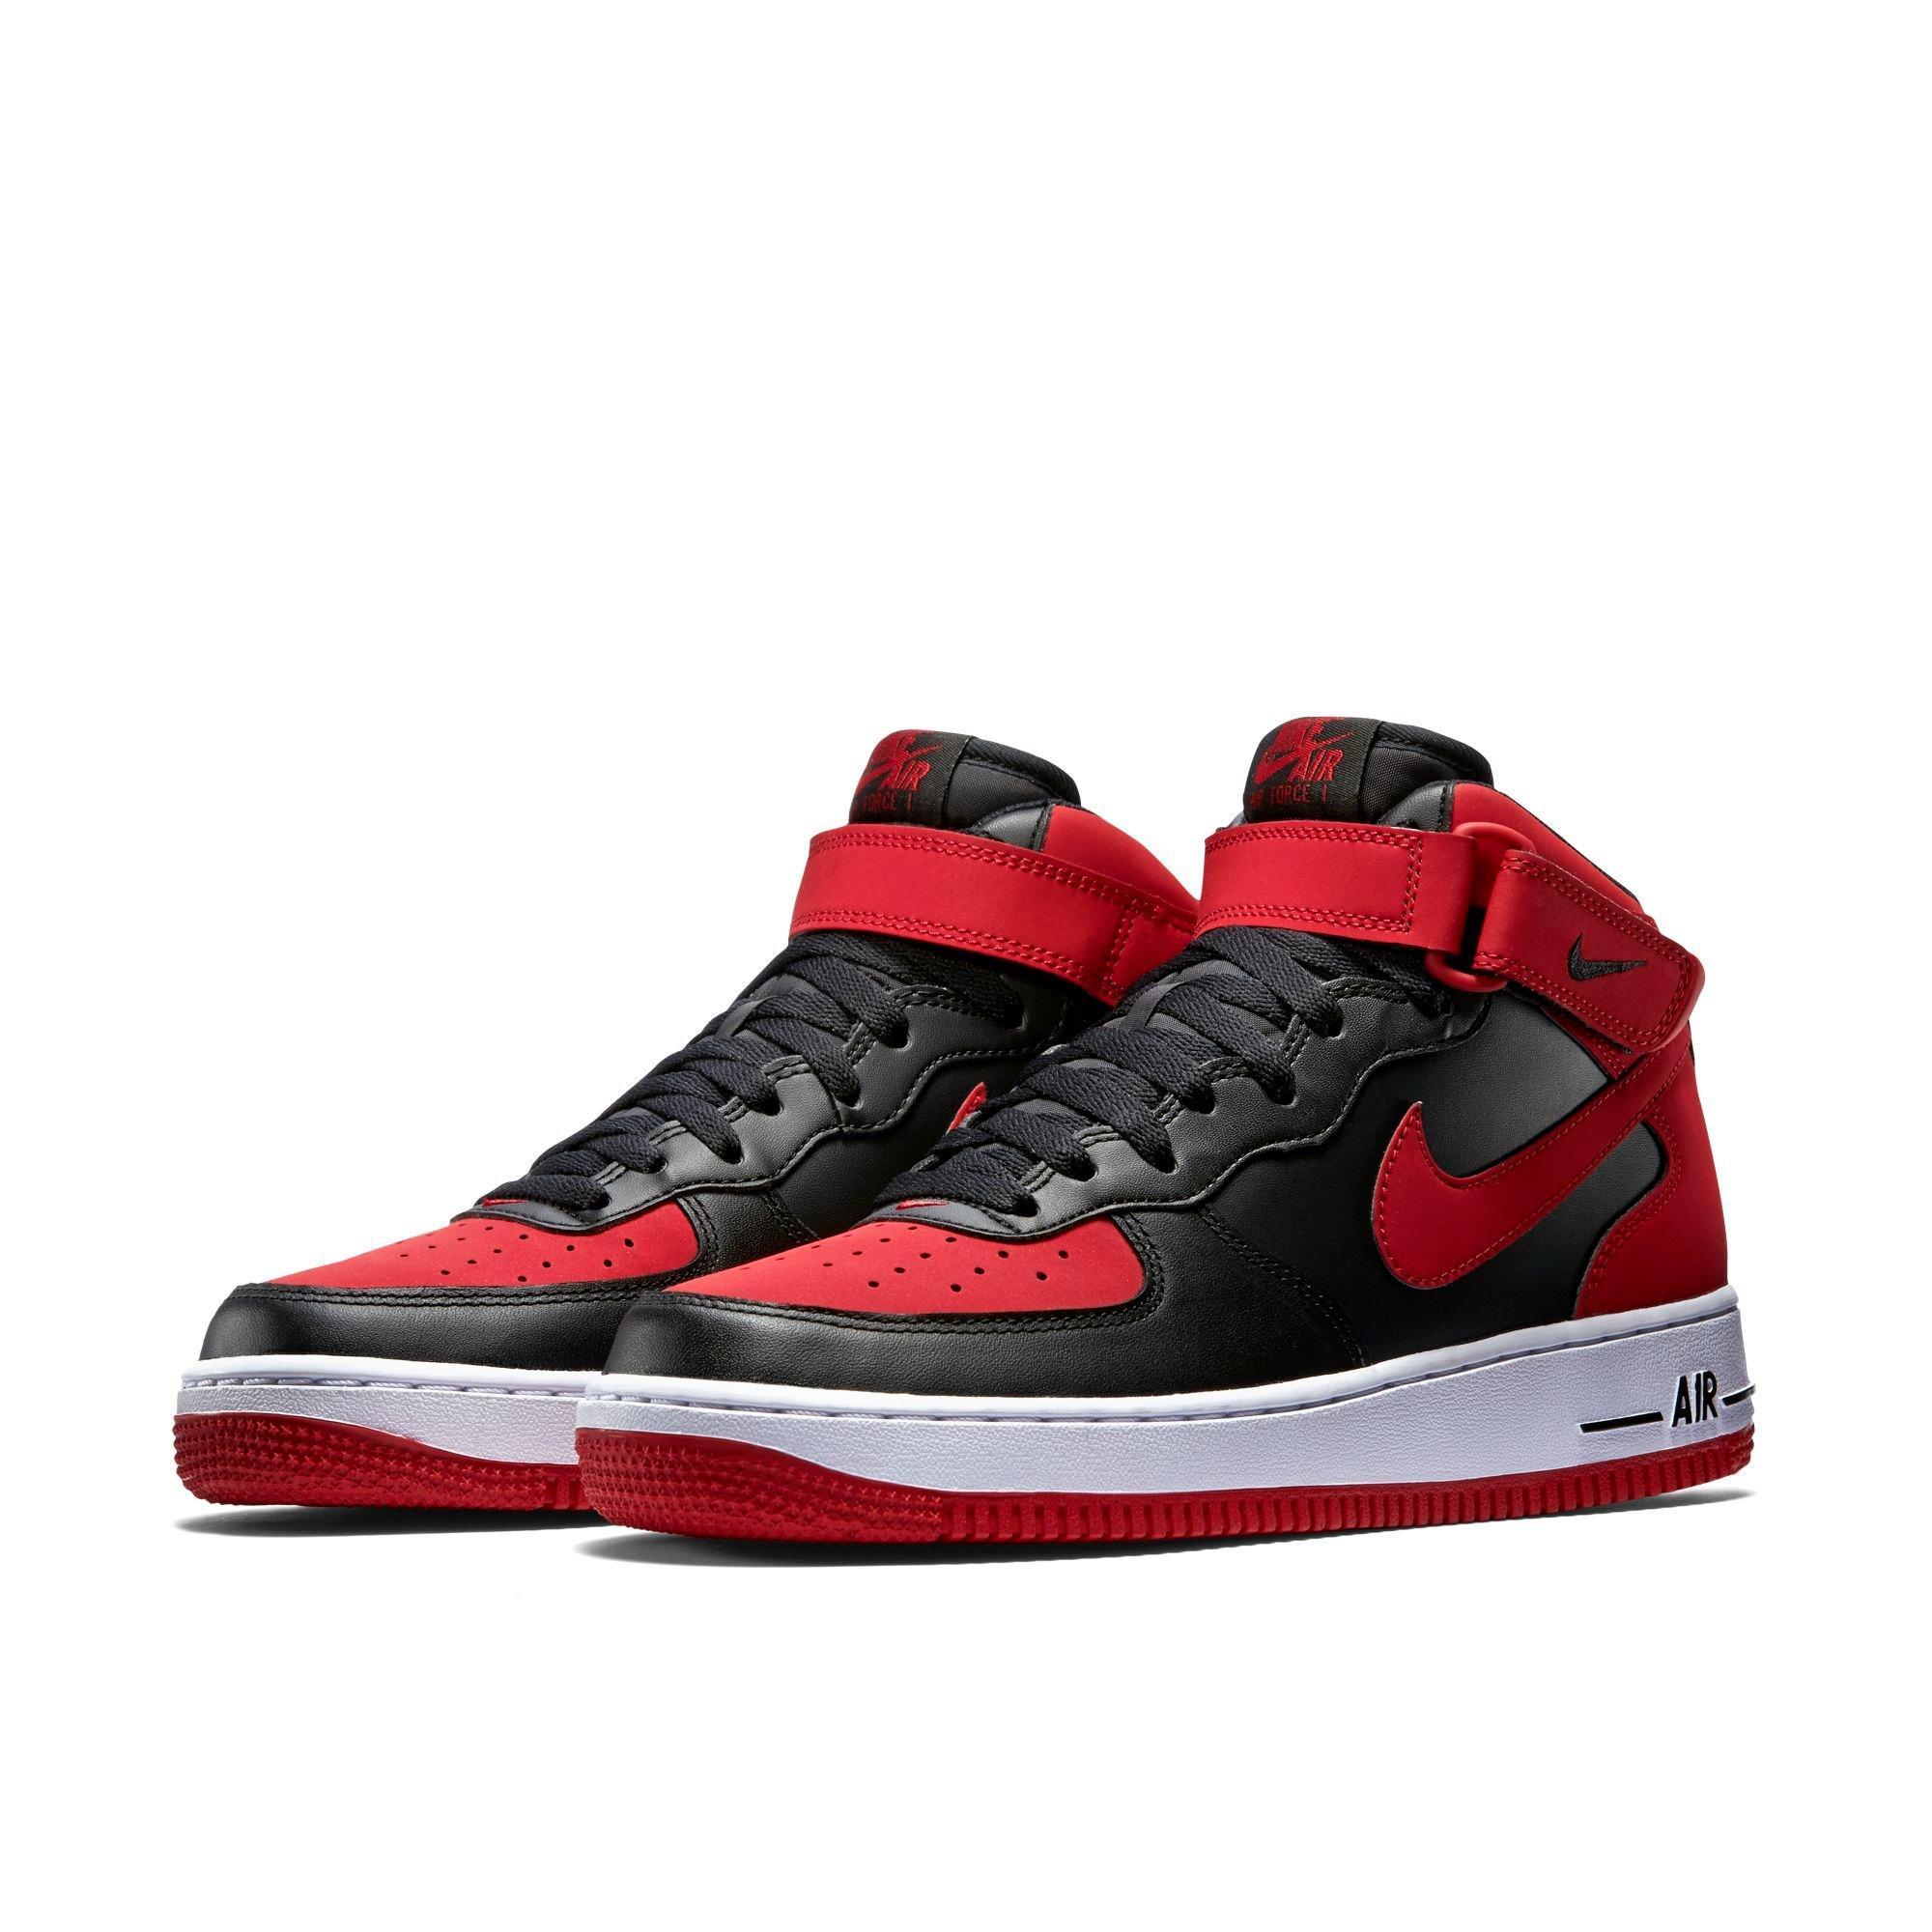 Nike Air Force 1 Mi Hommes Noir / Rouge Chaussures De Basket-ball